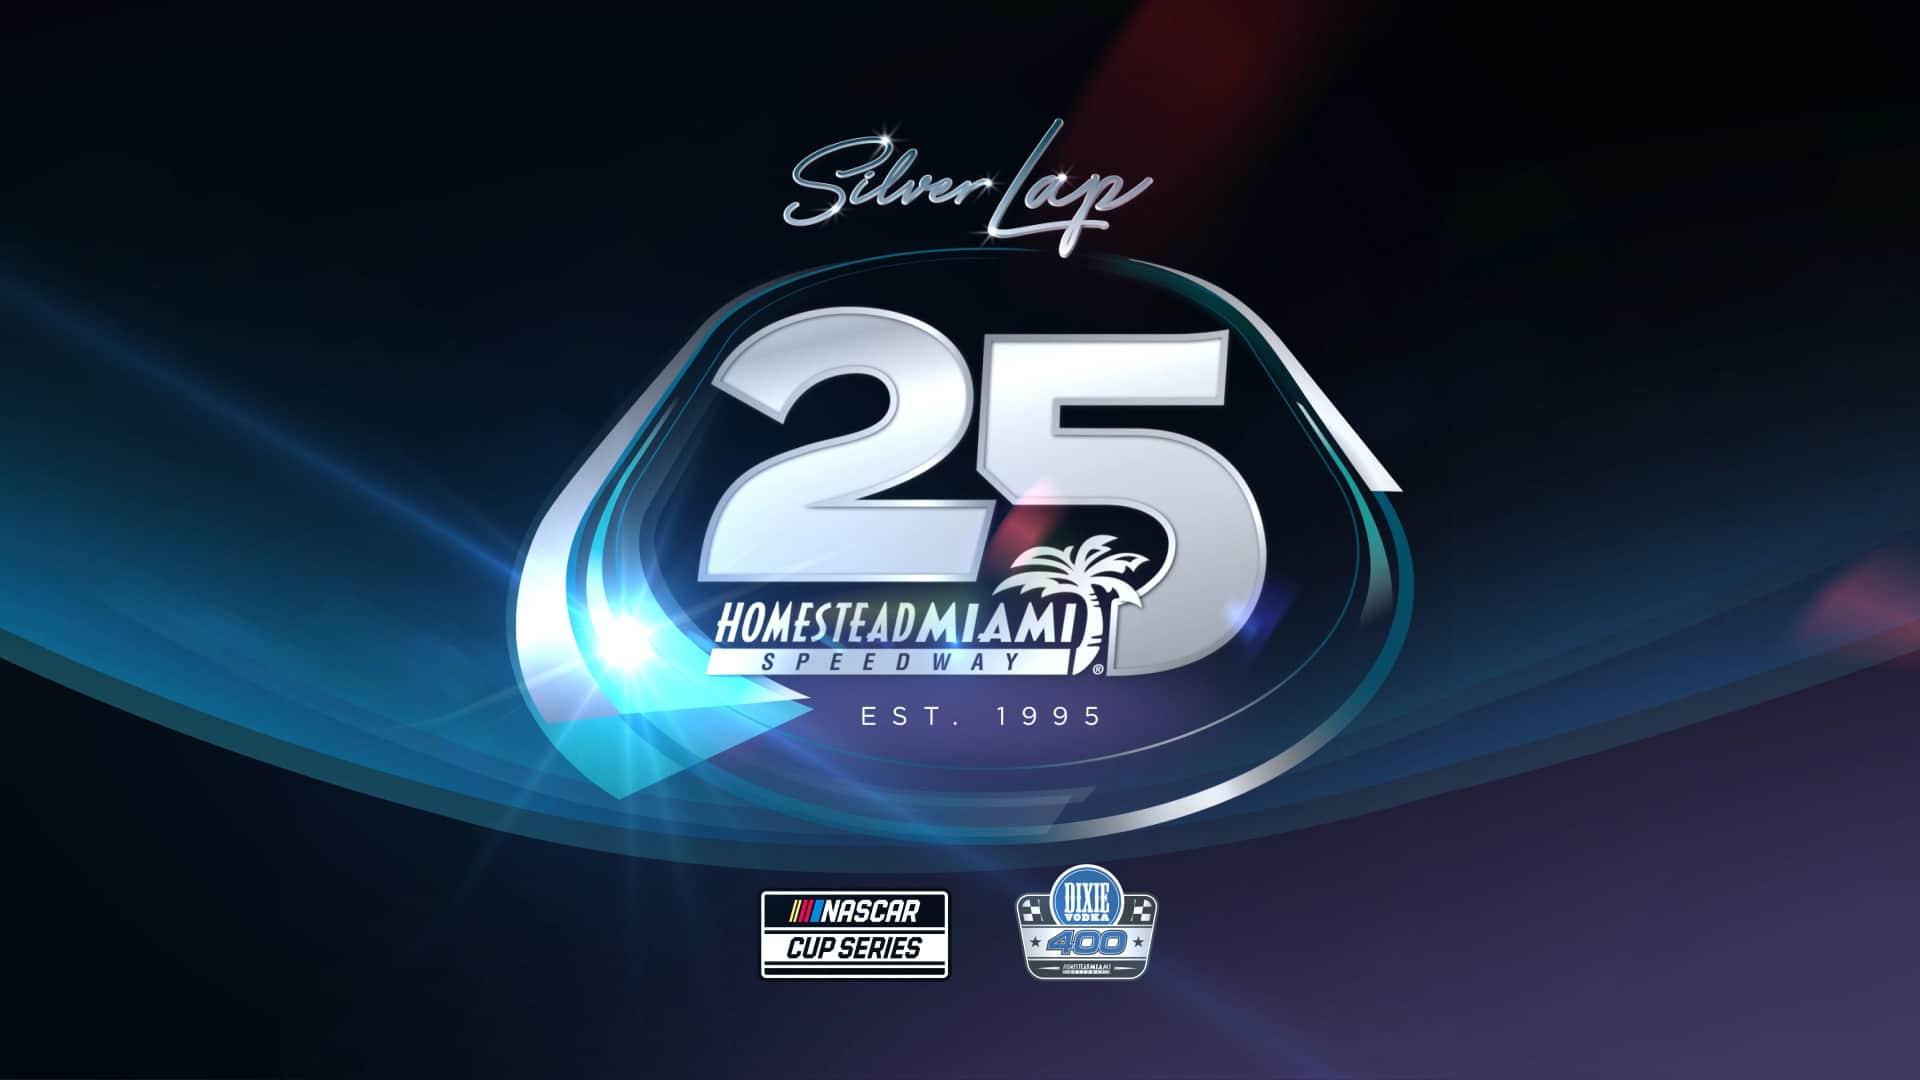 Homestead-Miami Speedway 25th Anniversary